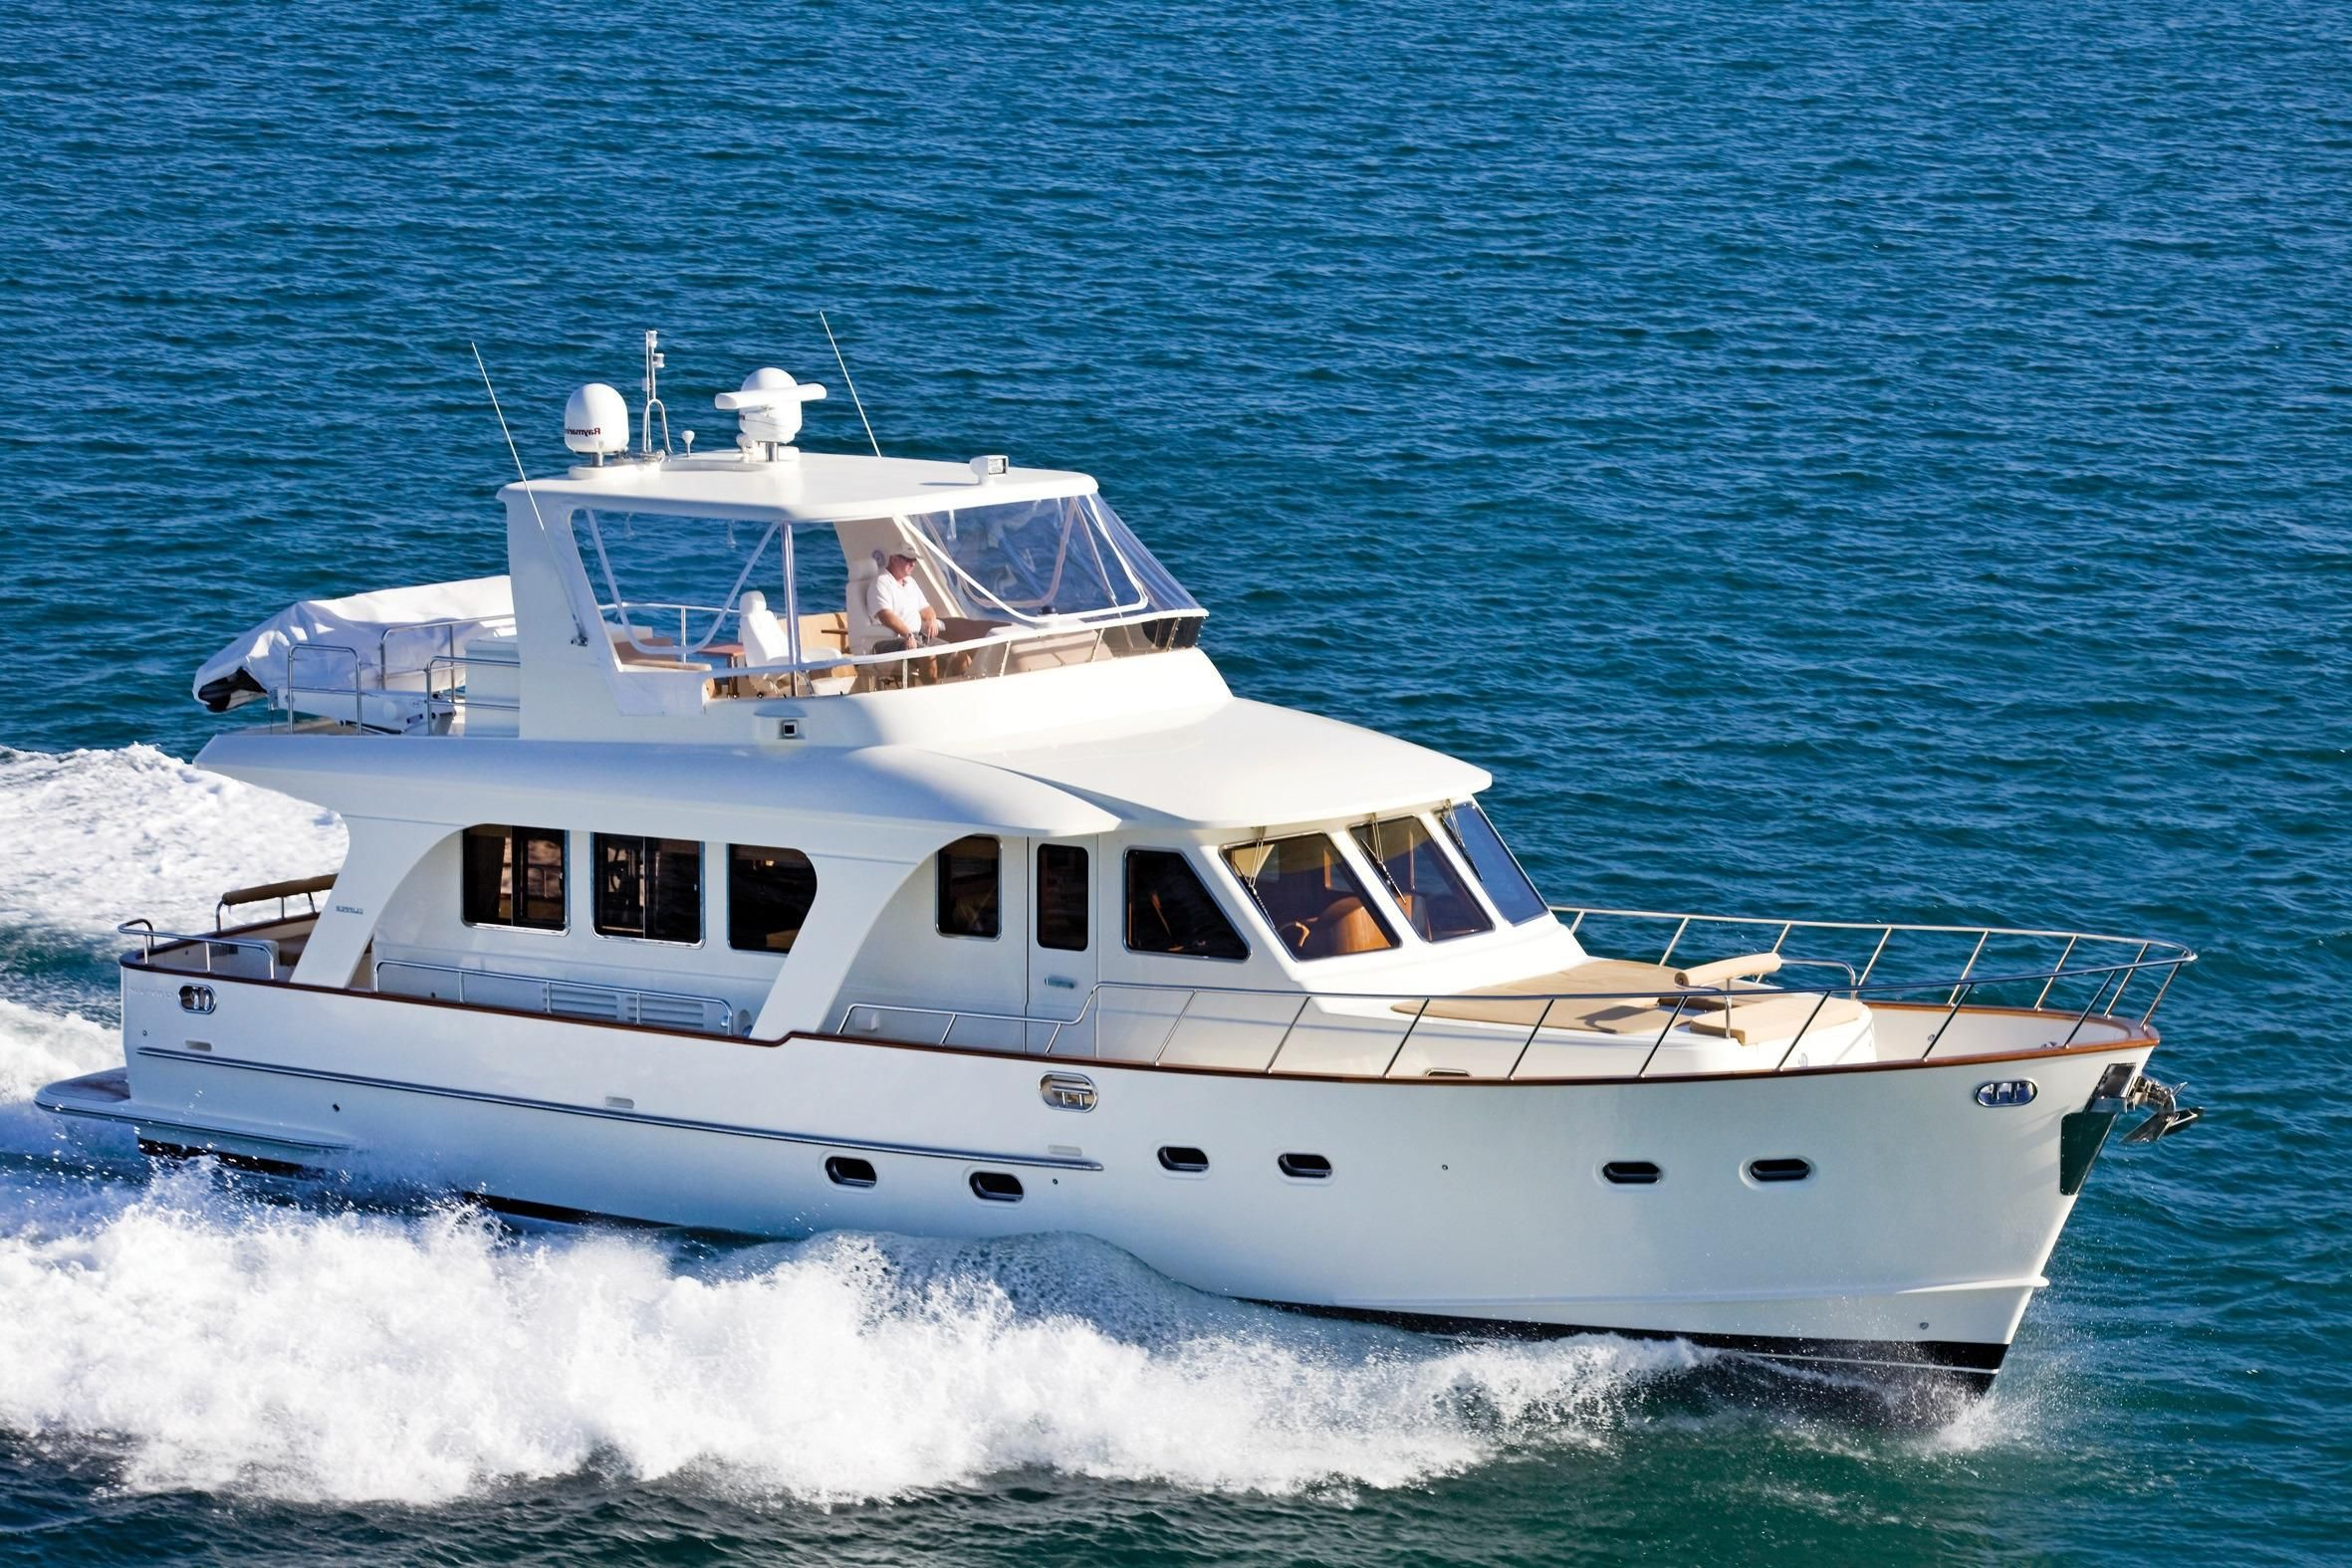 Motor Yacht: 2017 Explorer Motor Yachts 60/62 Power Boat For Sale